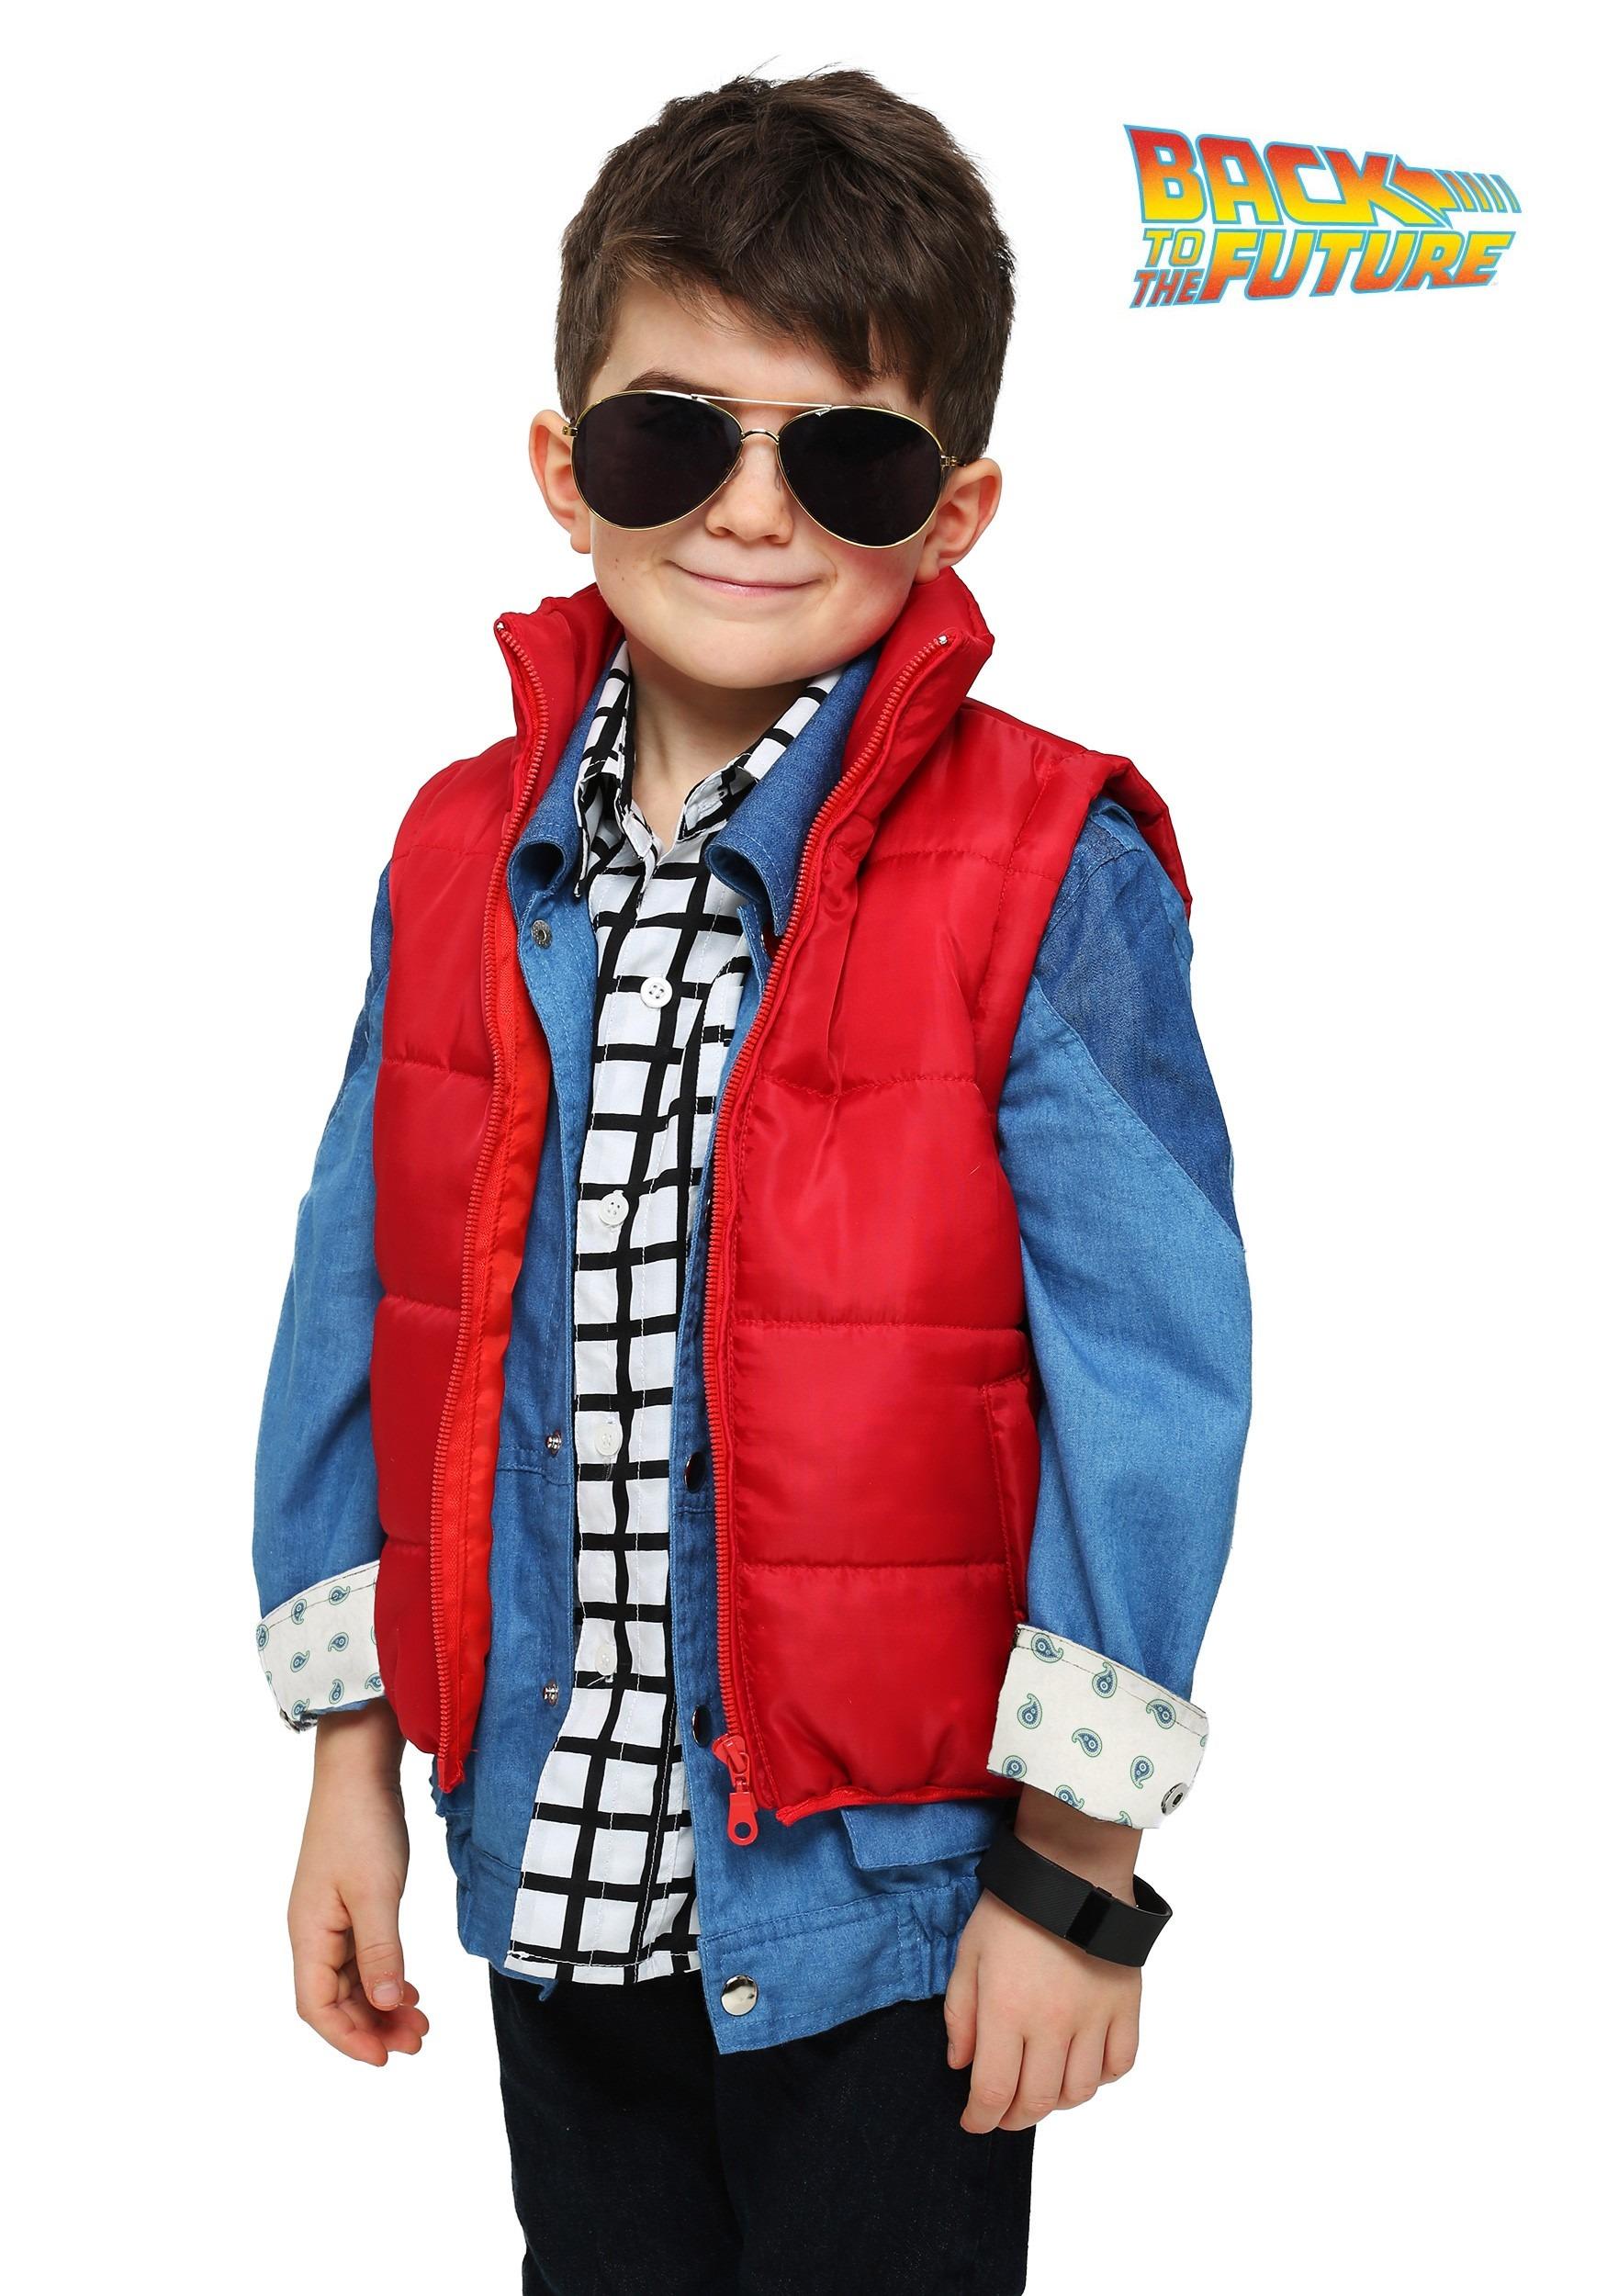 Toddler Marty McFly Ve...